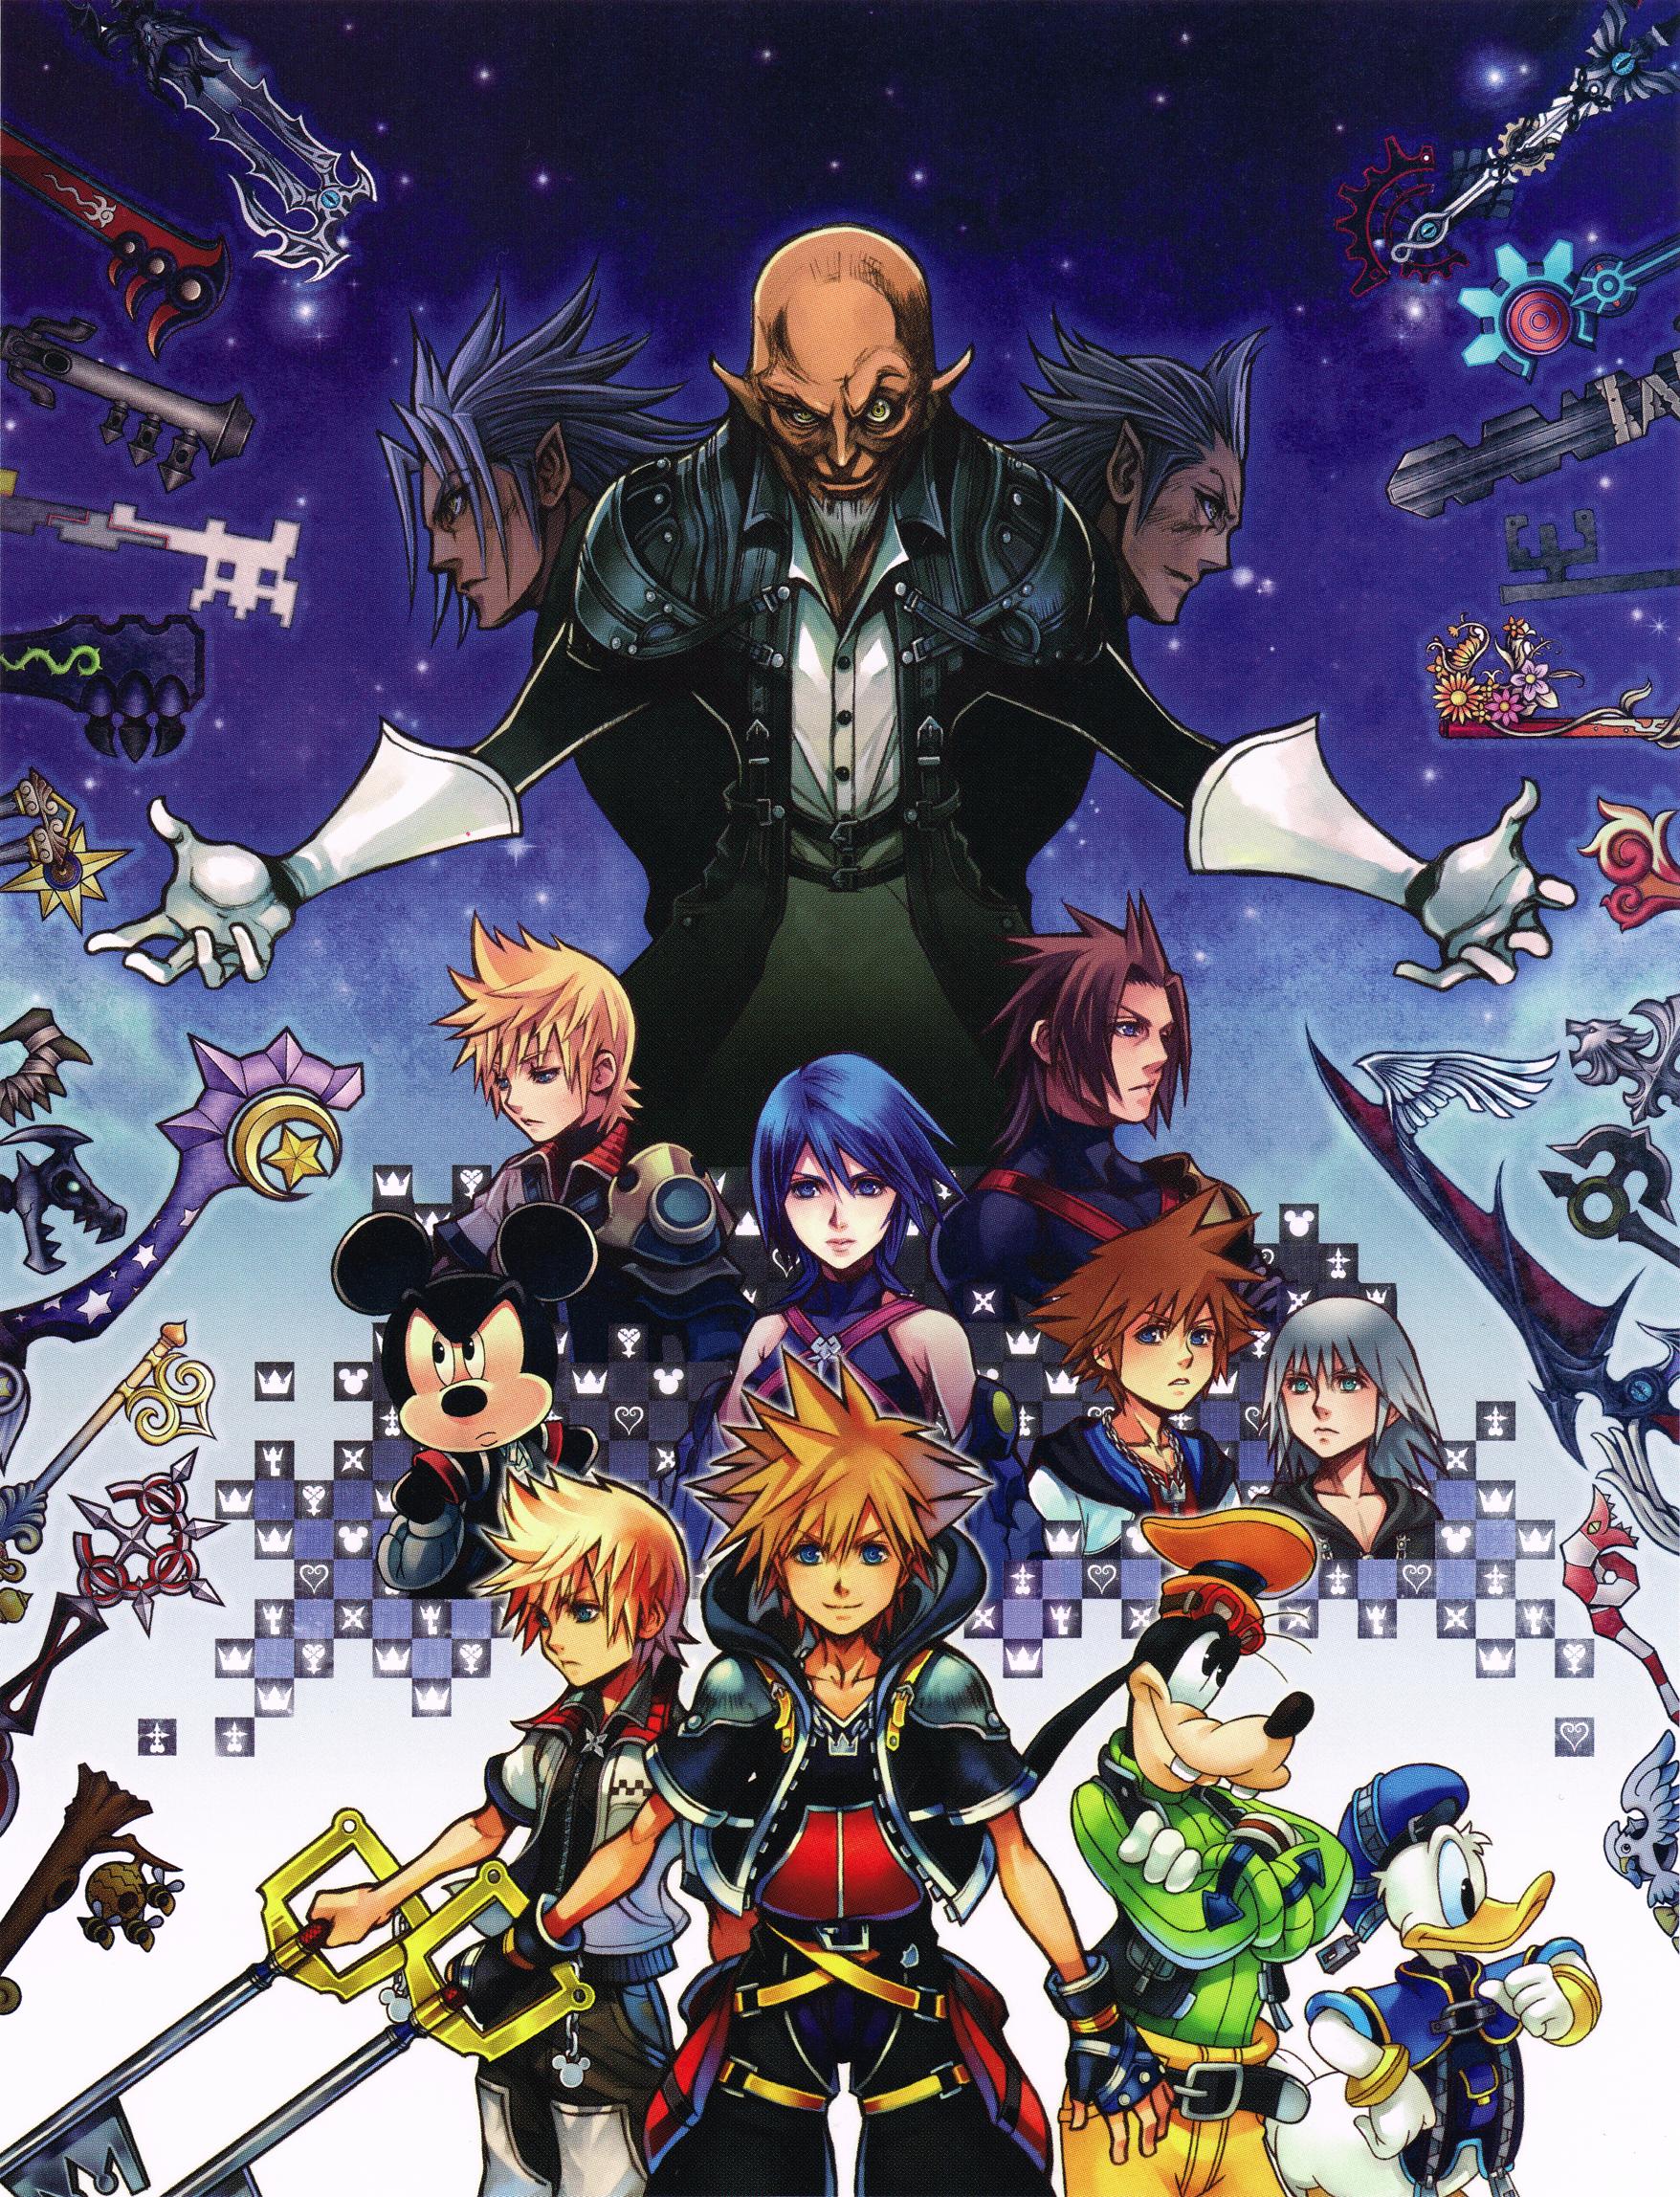 Kh2 5 Poster Crop Png 1756 2296 Kingdom Hearts Hd Kingdom Hearts Characters Kingdom Hearts